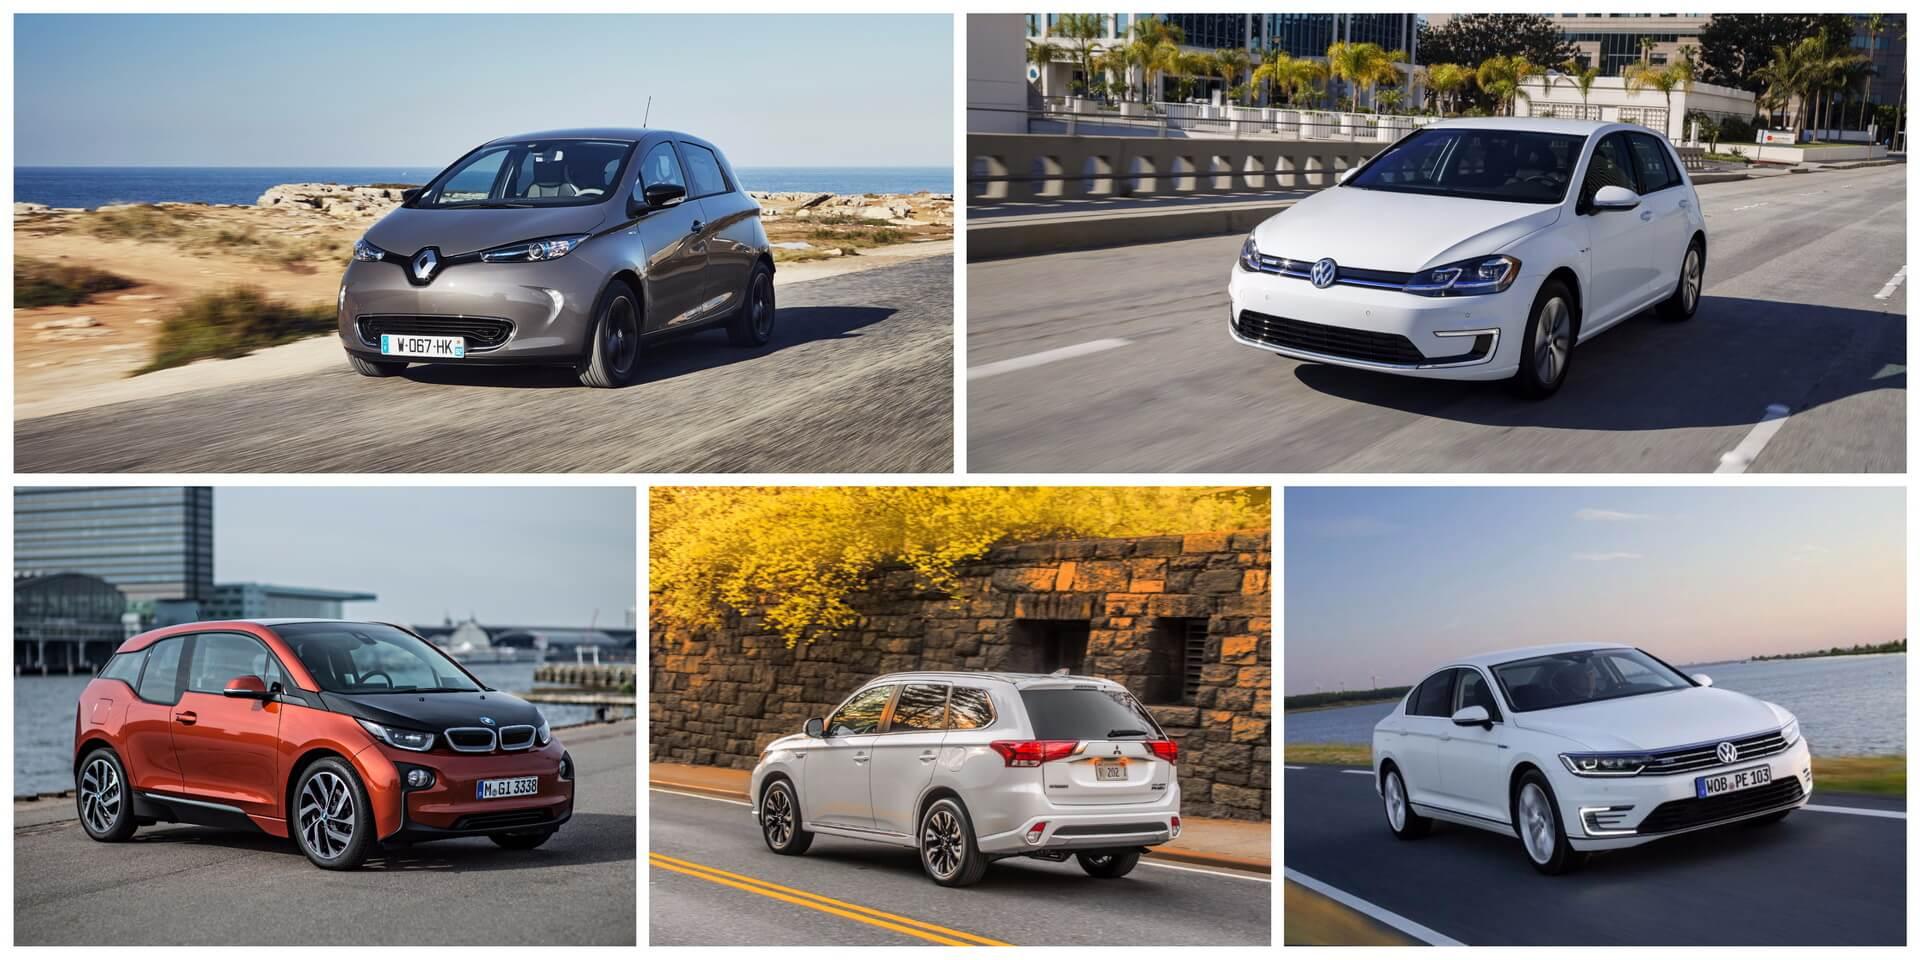 № 1 — Renault Zoe   № 2 — VW e-Golf   № 3 — BMW i3   № 4 — Mitsubishi Outlander PHEV   № 5 — VW Passat GTE